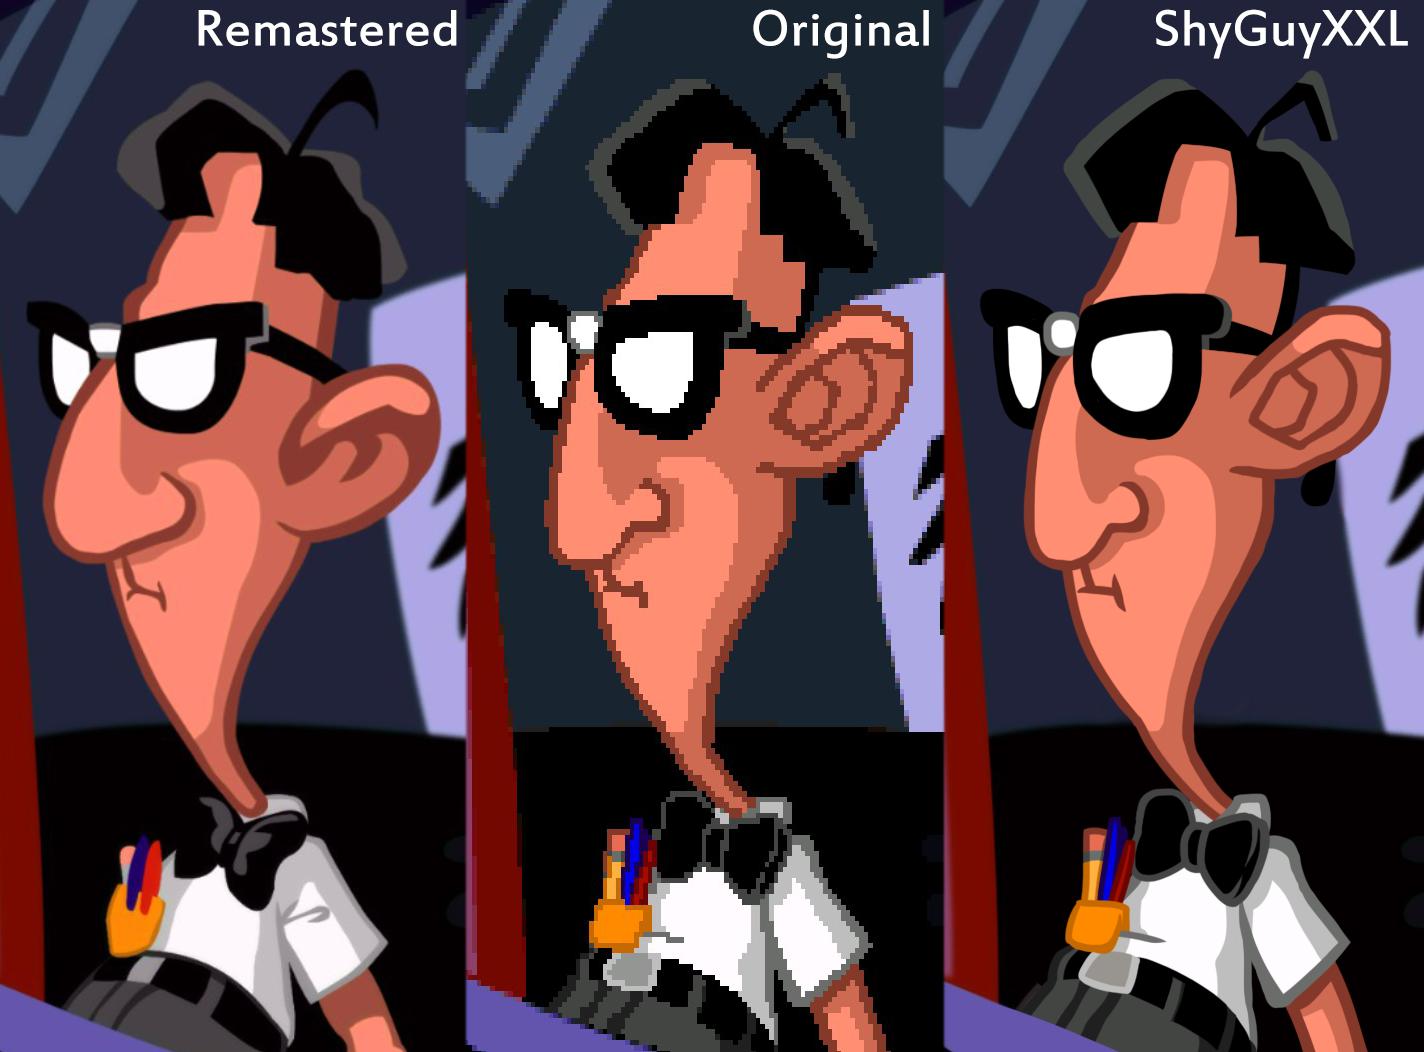 dott___remastered_remastered_by_shyguyxxl-d9y3b31.png